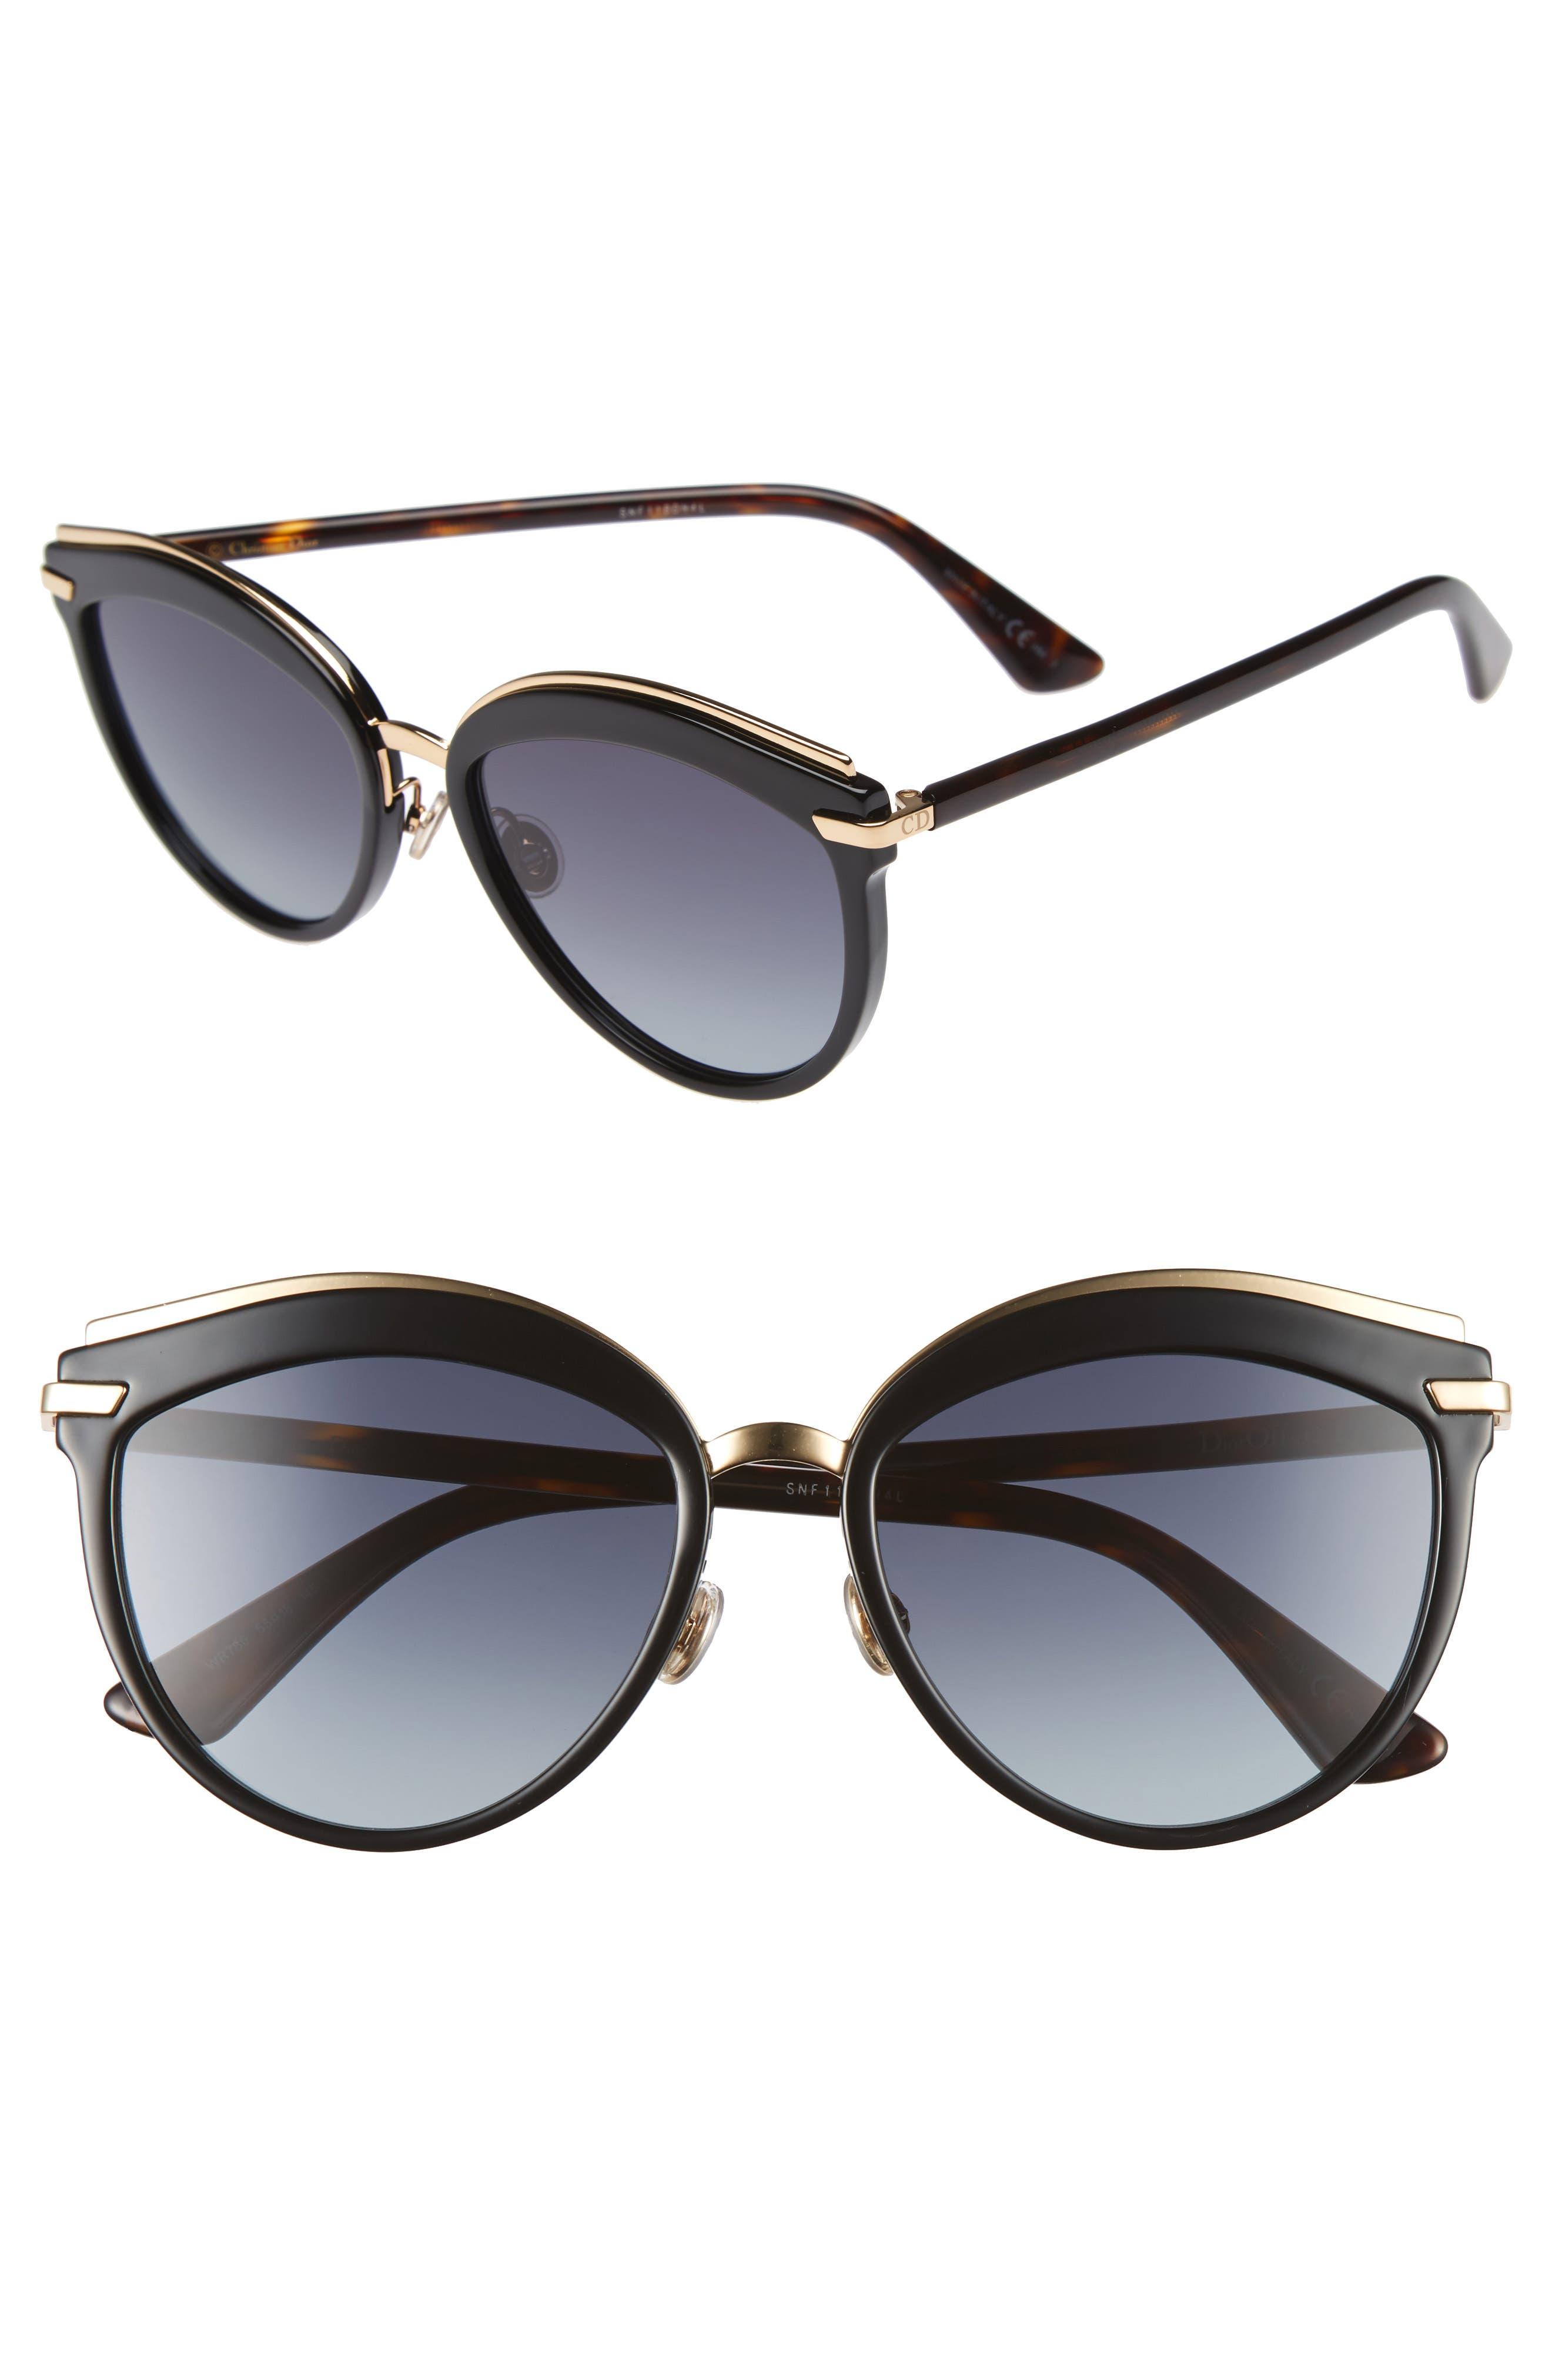 Offset 2 55mm Sunglasses,                             Main thumbnail 1, color,                             Black/ Havana